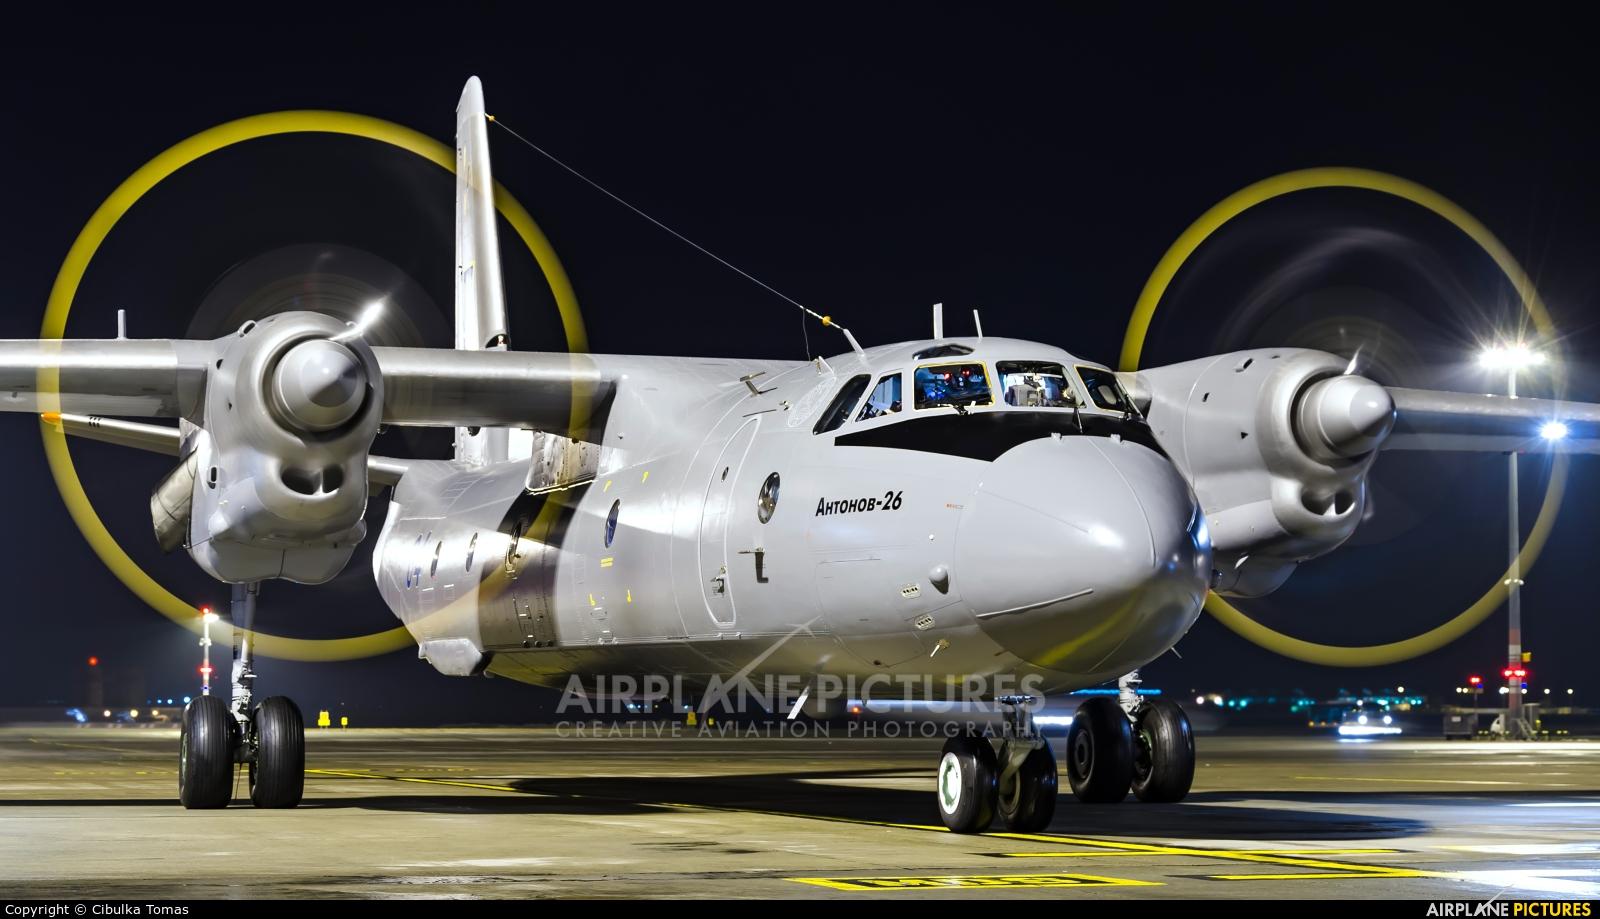 Ukraine - Air Force 04 aircraft at Prague - Václav Havel